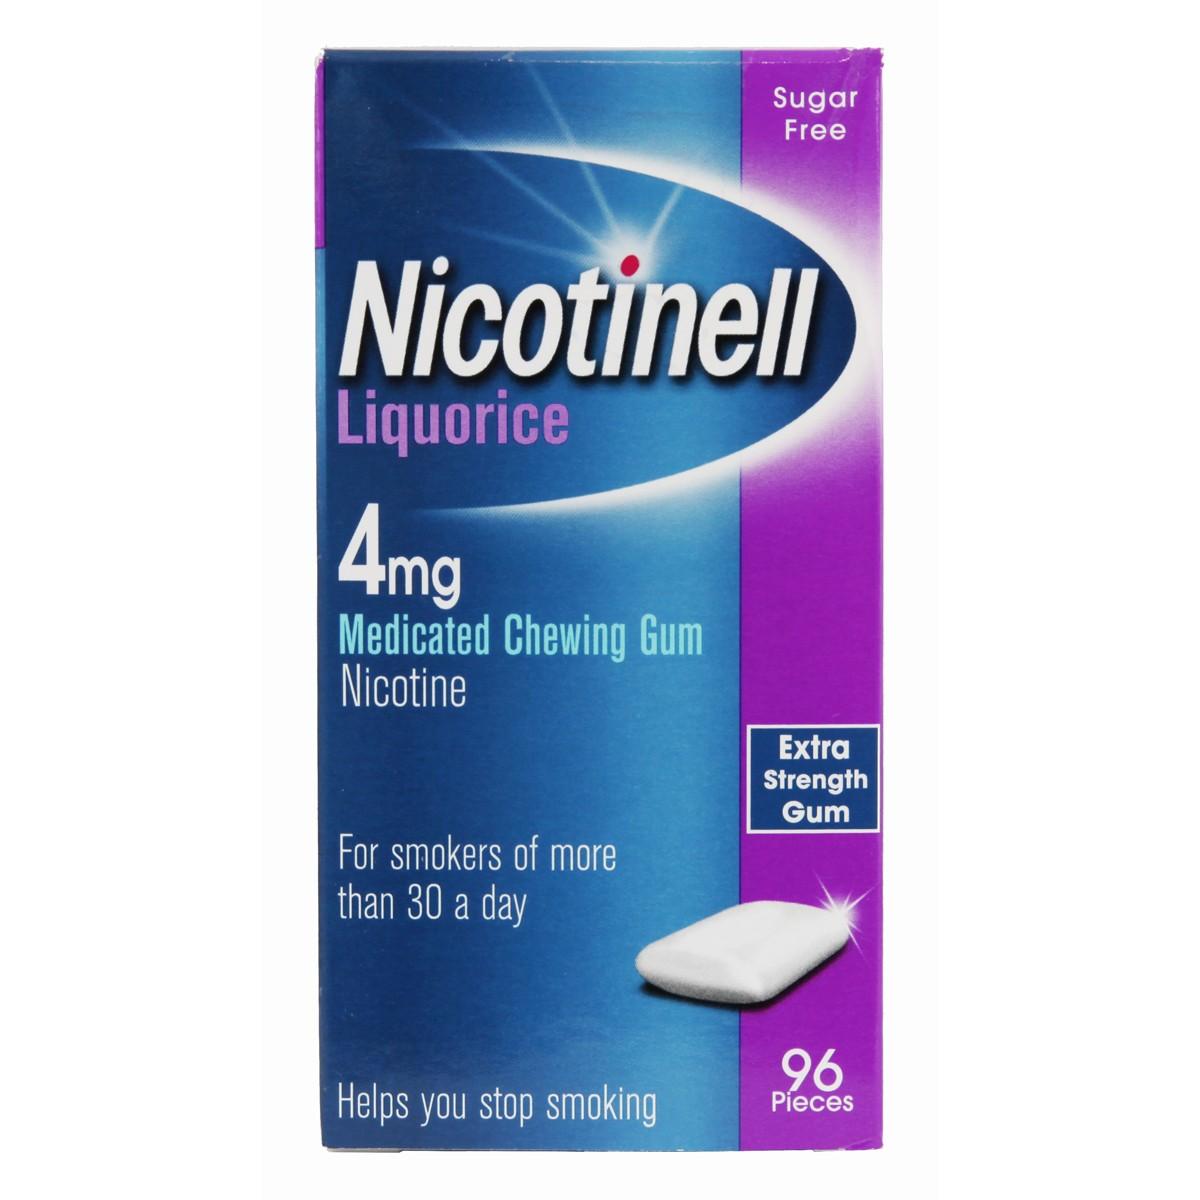 Nicotinell Liquorice Chewing Gum 4mg